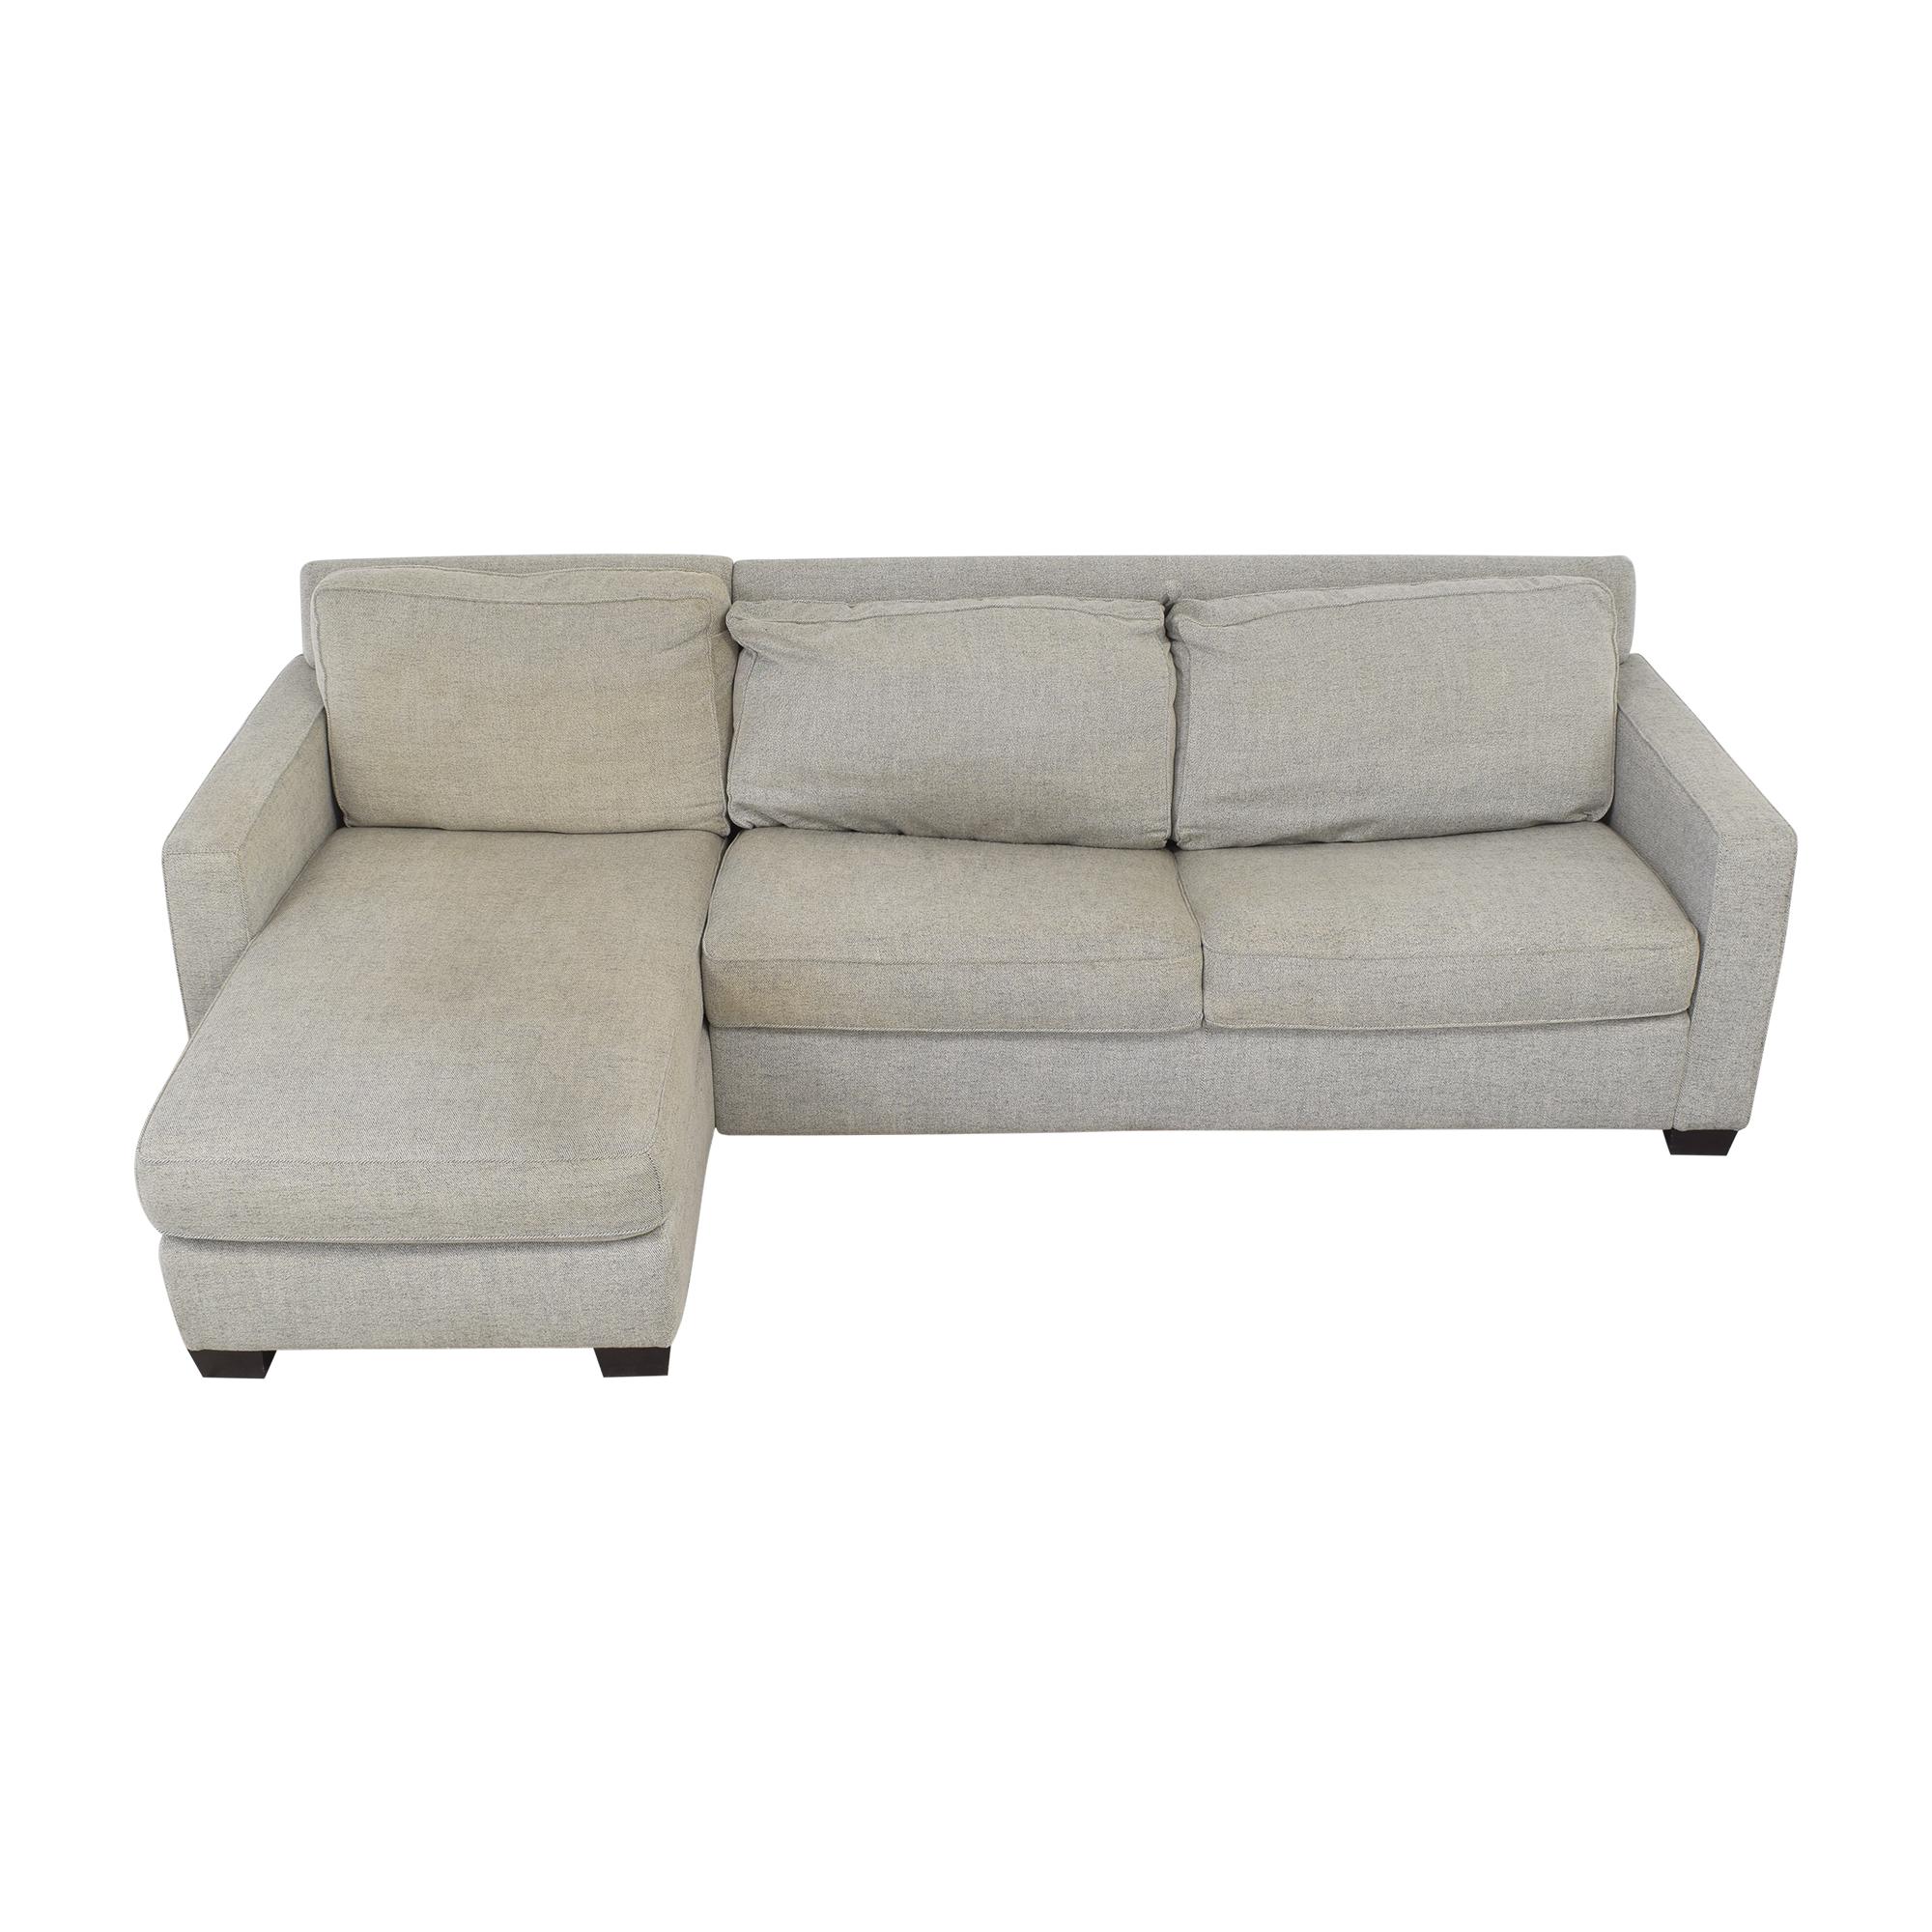 West Elm West Elm Henry 2-Piece Full Sleeper Storage Sofa Sofas